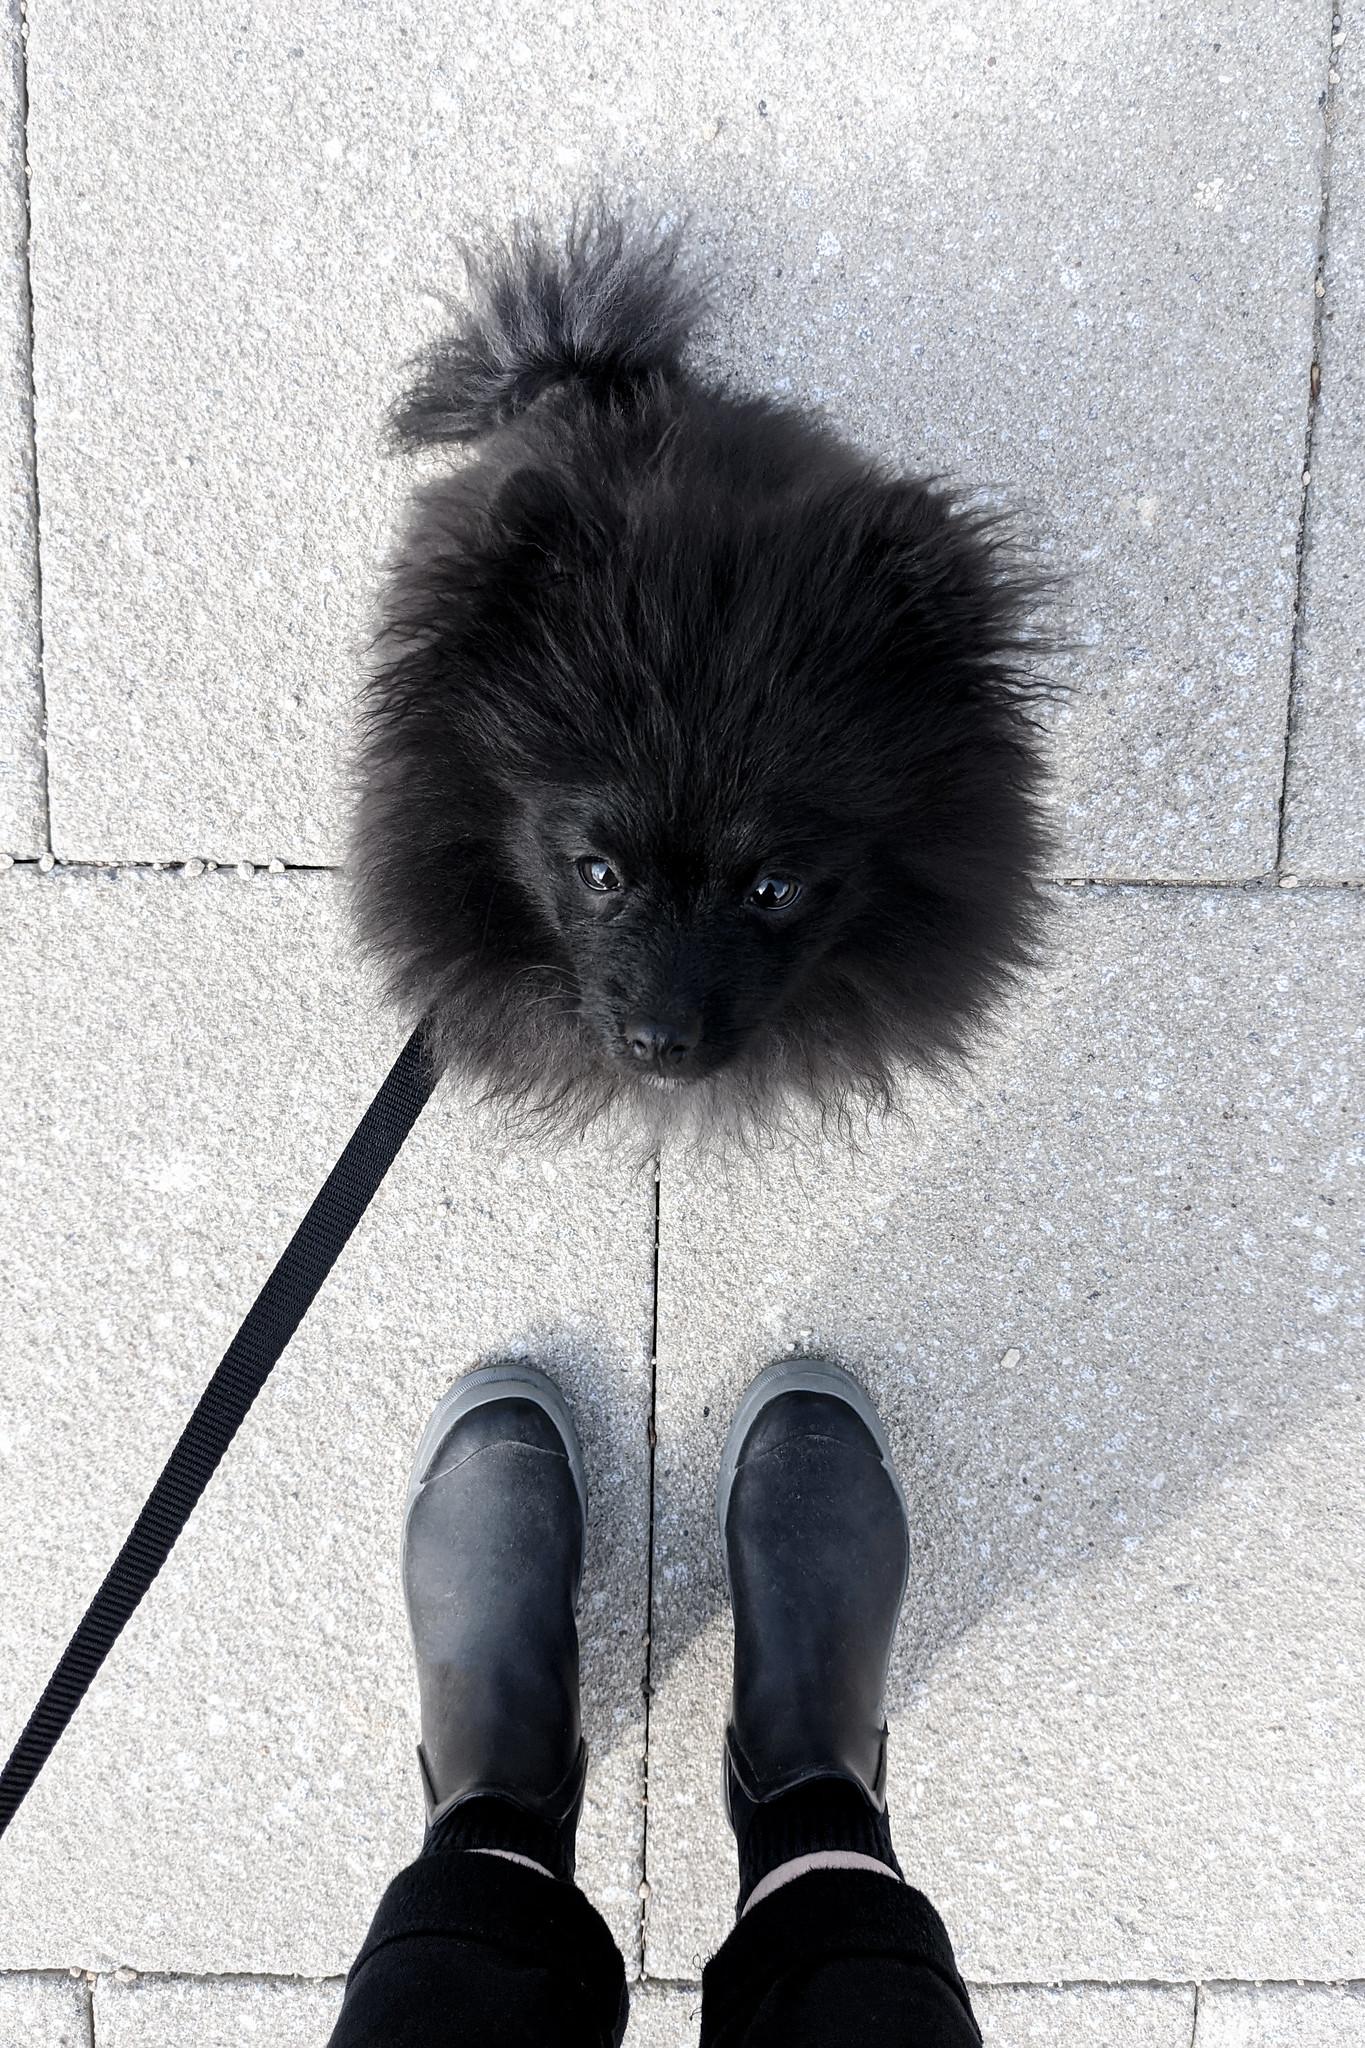 A Dog Walkers Capsule Wardrobe